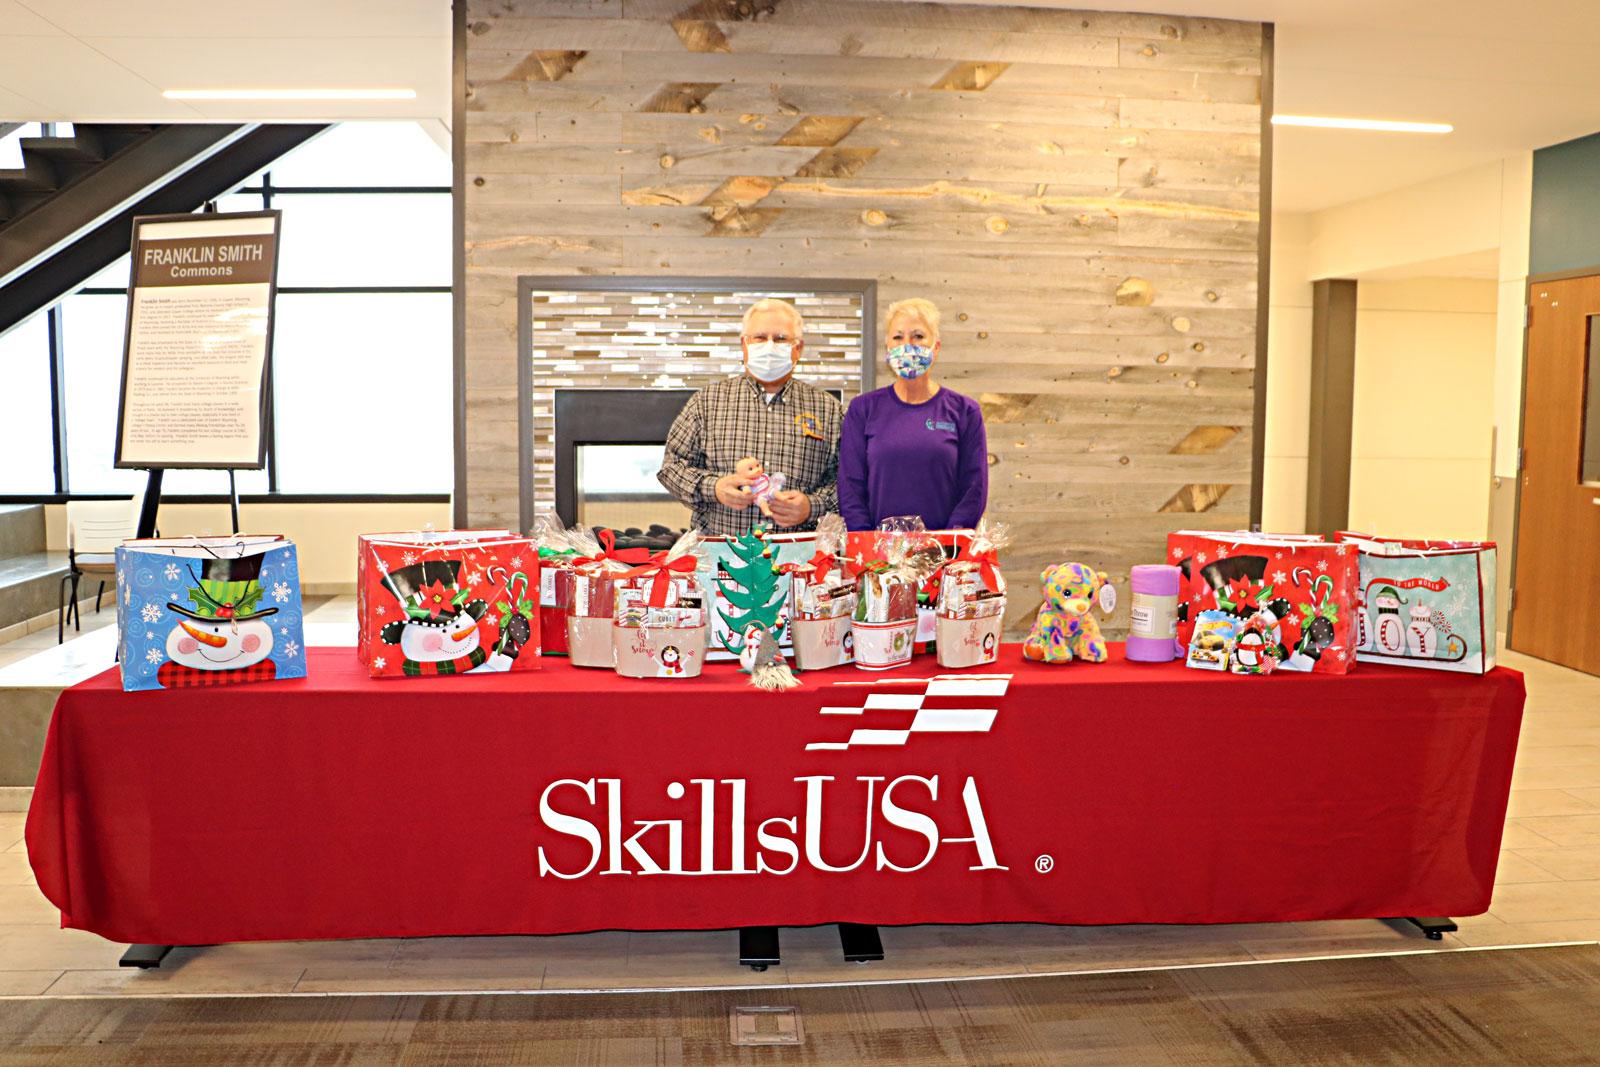 Ewc Skillsusa Members Donate Gifts To The Torrington For Spokane Community College Christmas Break Dates 2021